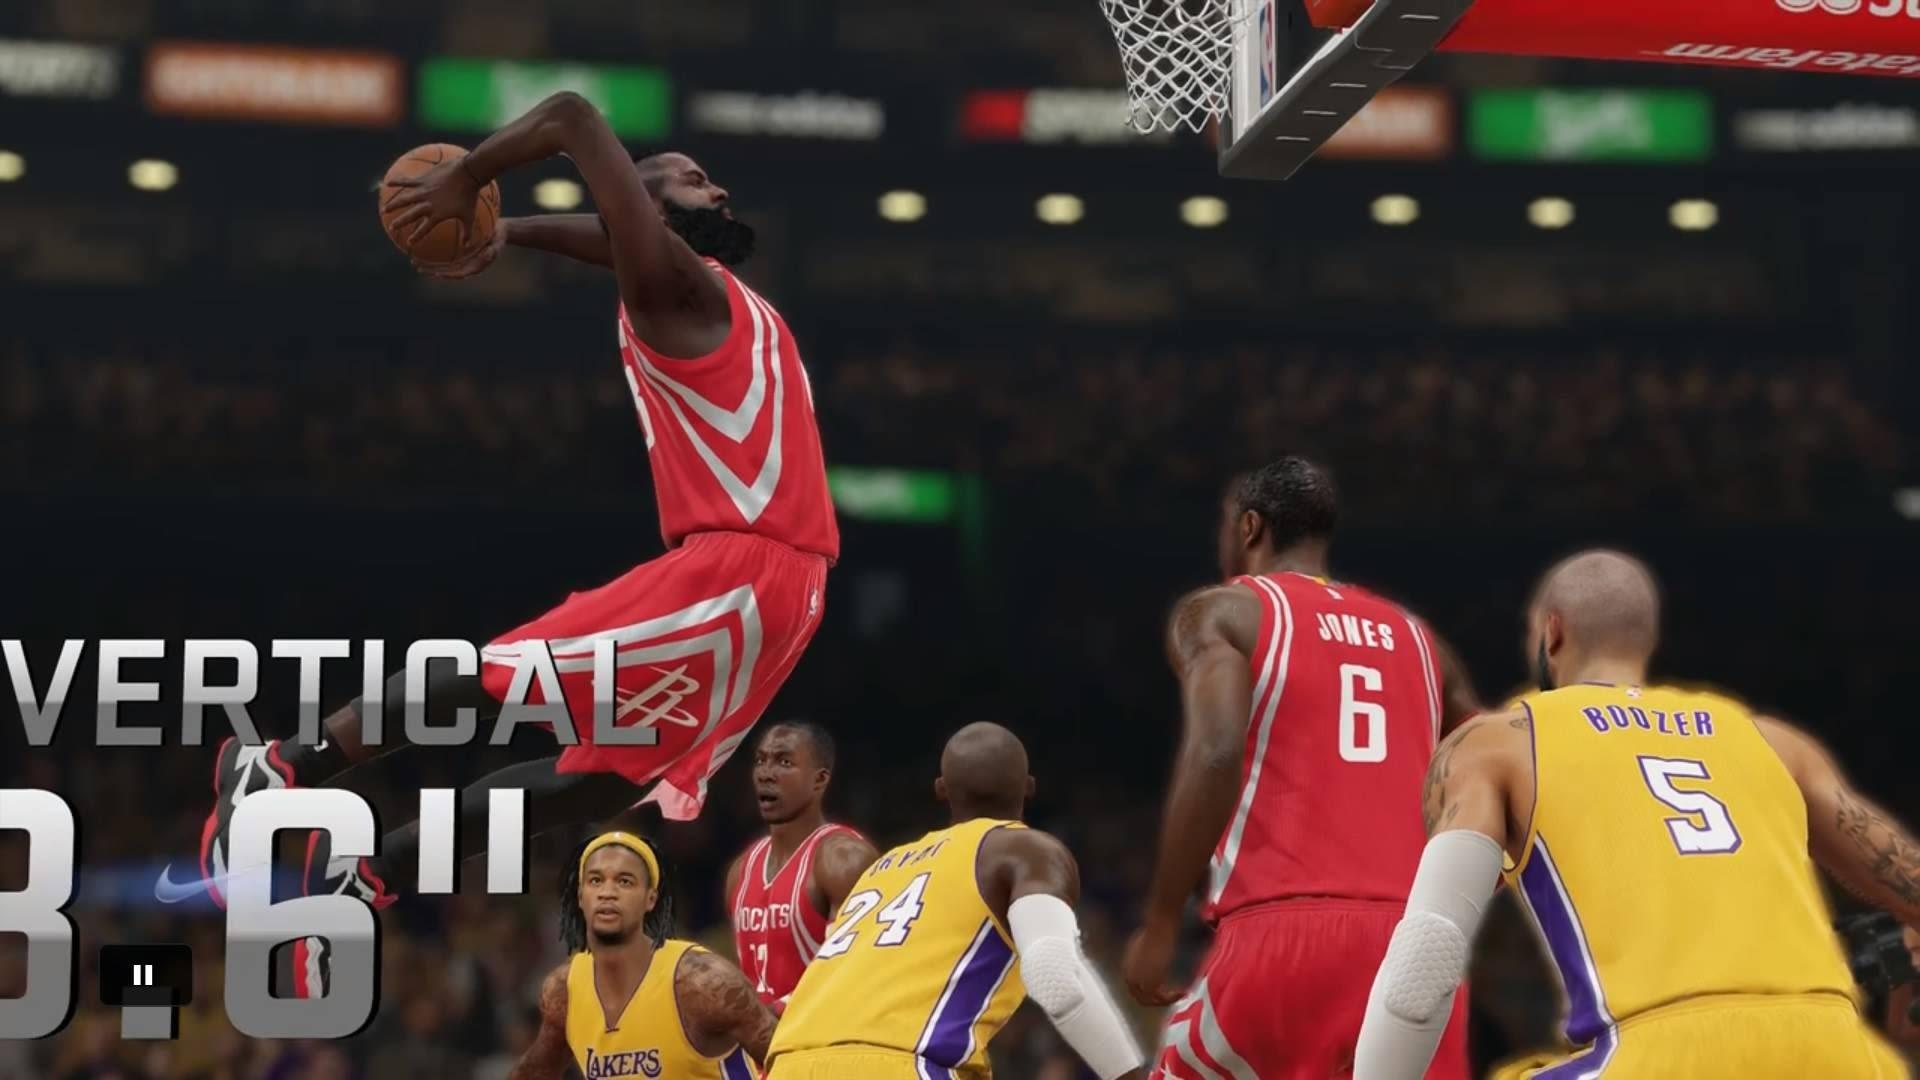 NBA 2K15 PS4 – Huge Dunk By James Harden – Houston Rockets vs LA